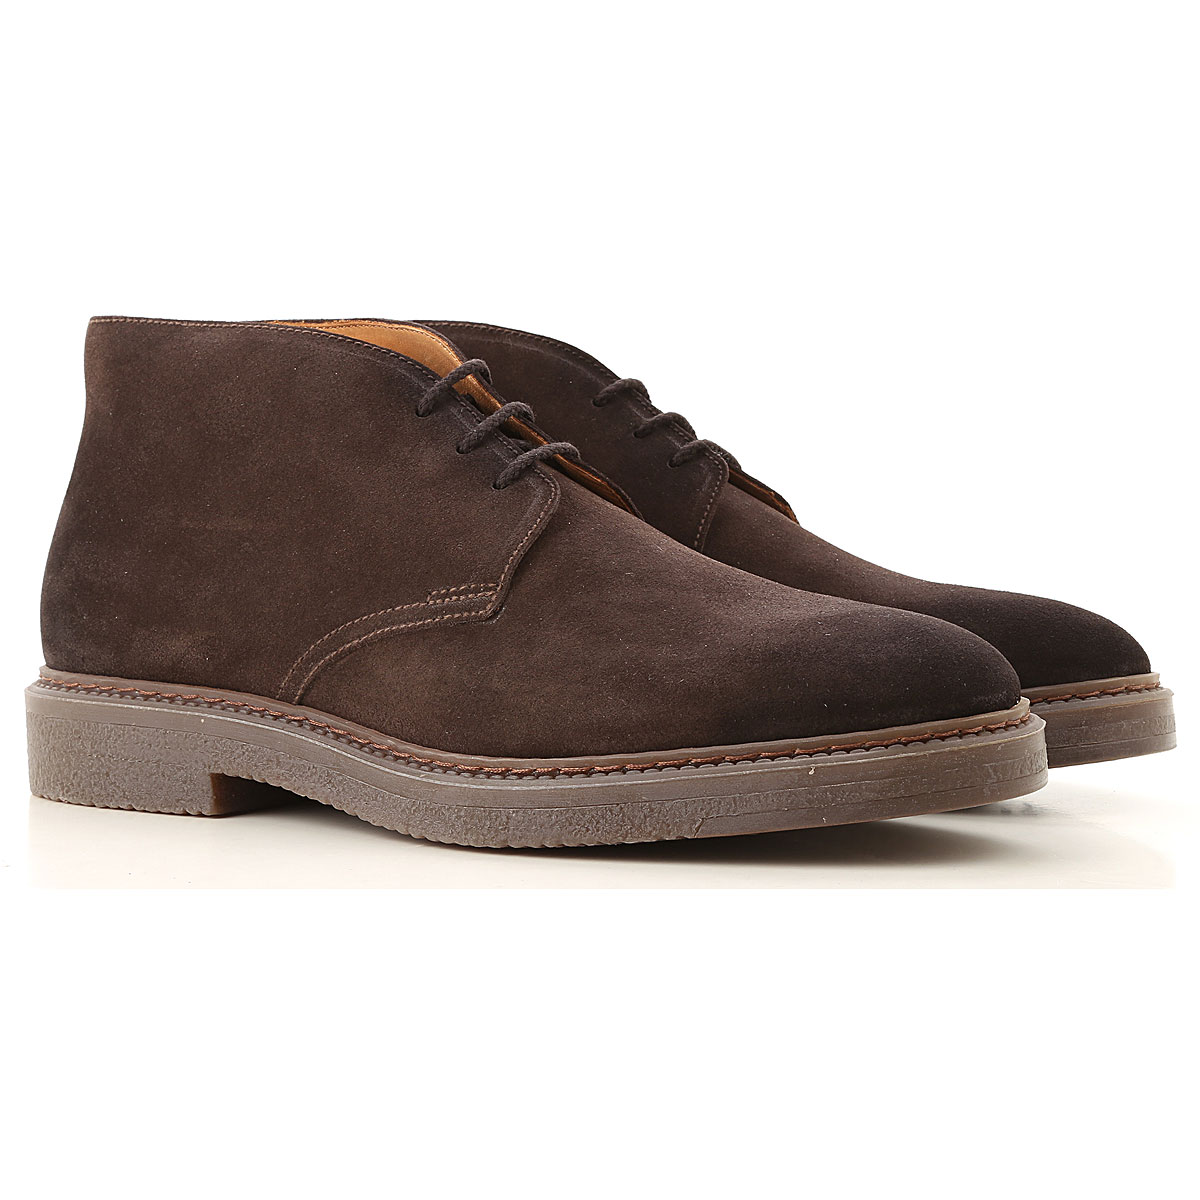 Doucals Desert Boots Chukka for Men, Brown, Leather, 2019, 10 10.5 11.5 7.5 8 9